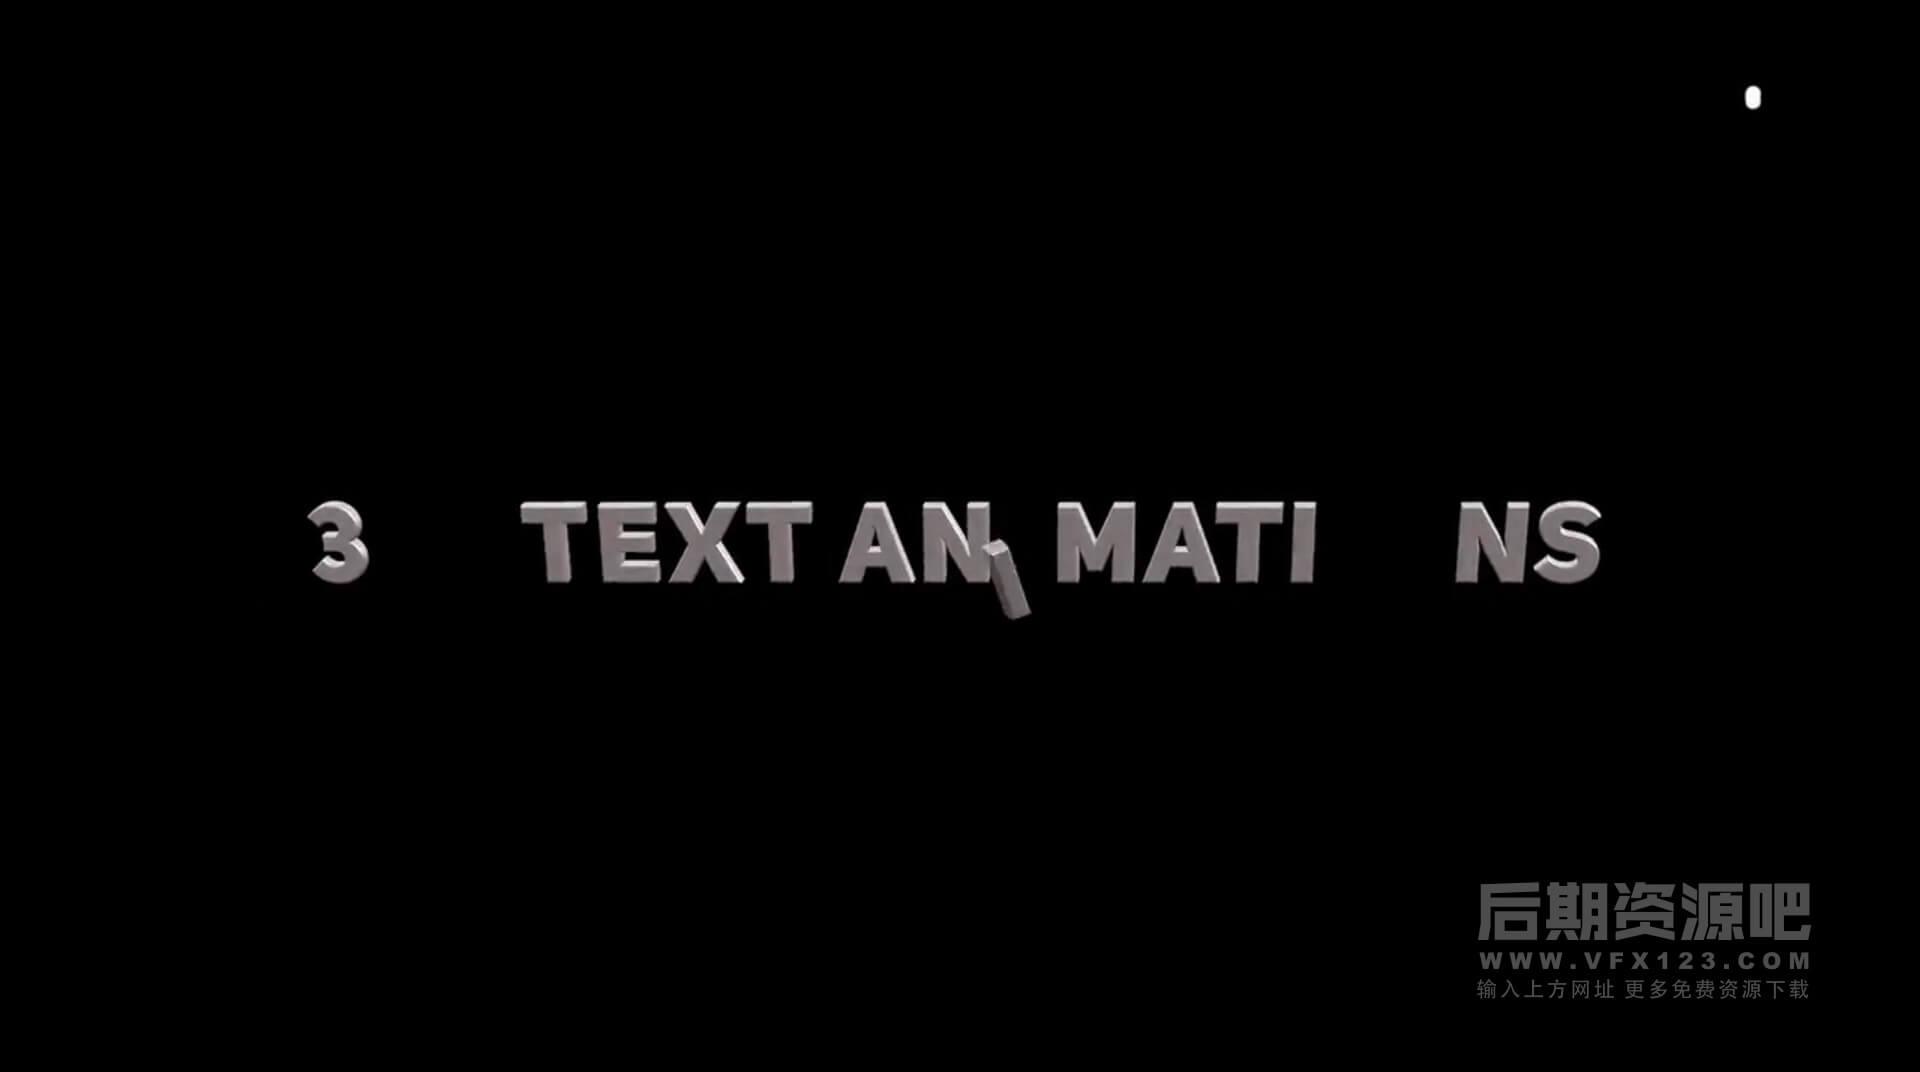 FCPX标题插件 16组3D立体效果弹跳飞出翻转字幕模板 3D Text Animations